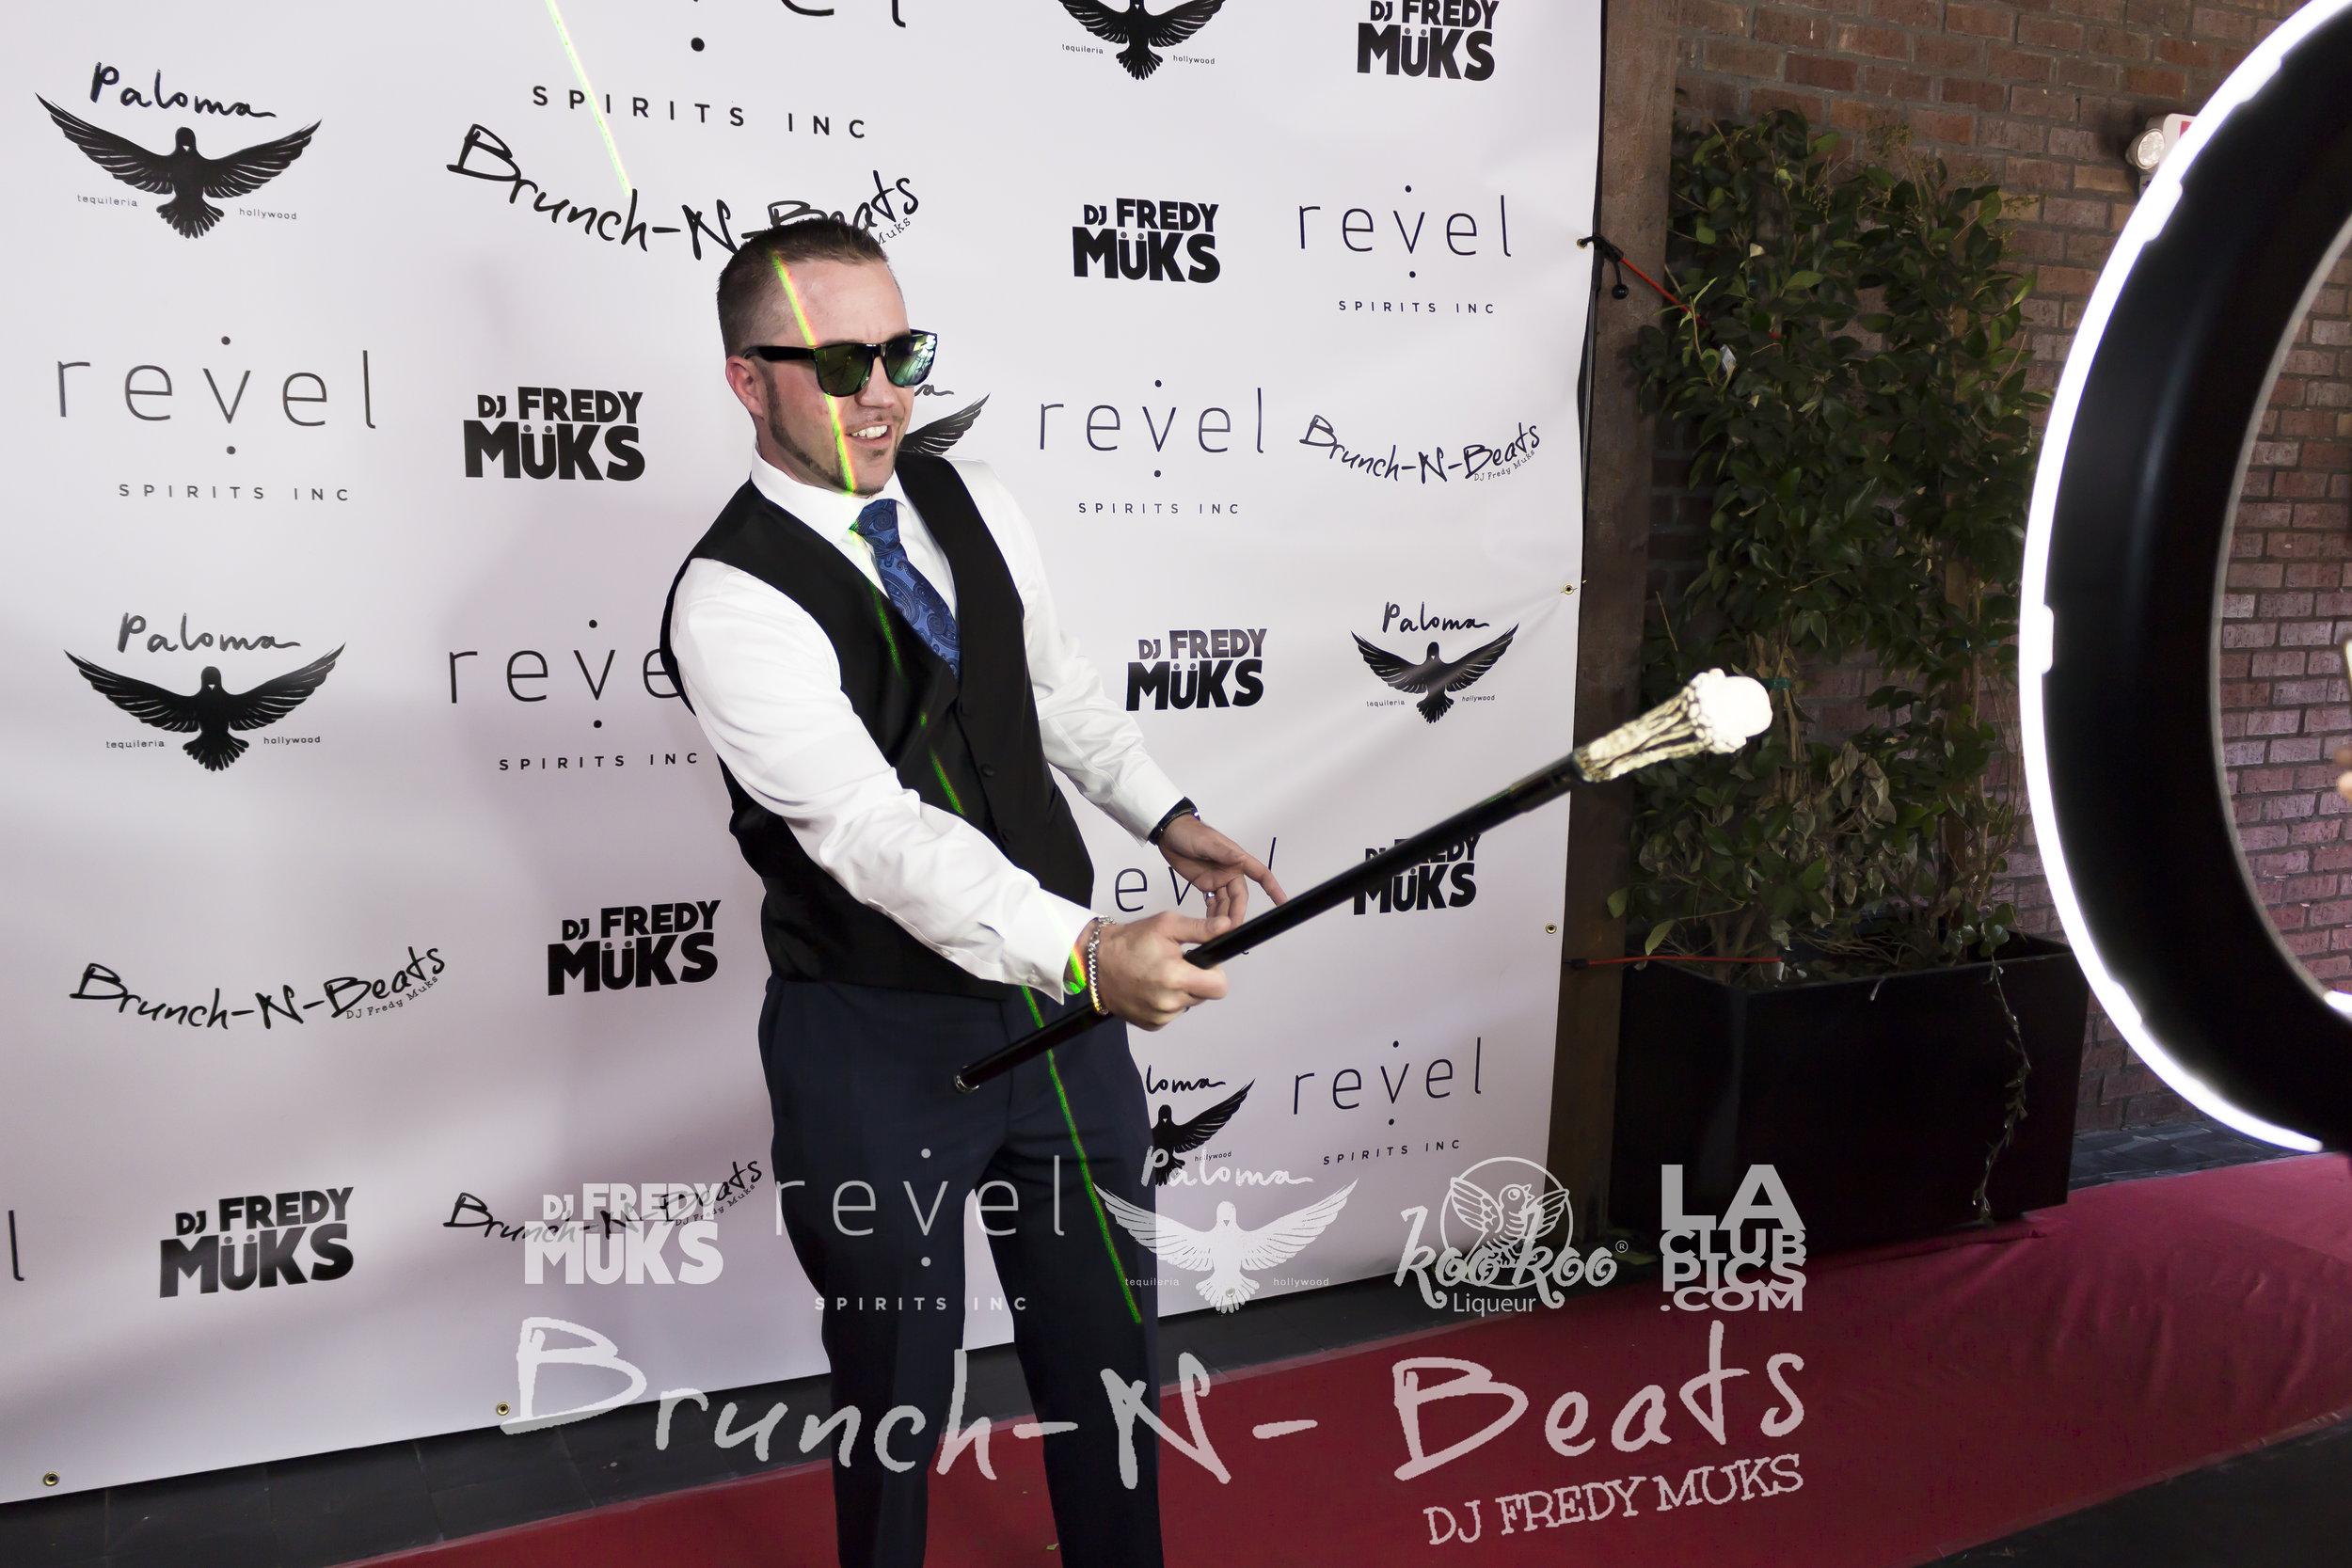 Brunch-N-Beats - Paloma Hollywood - 02-25-18_23.jpg